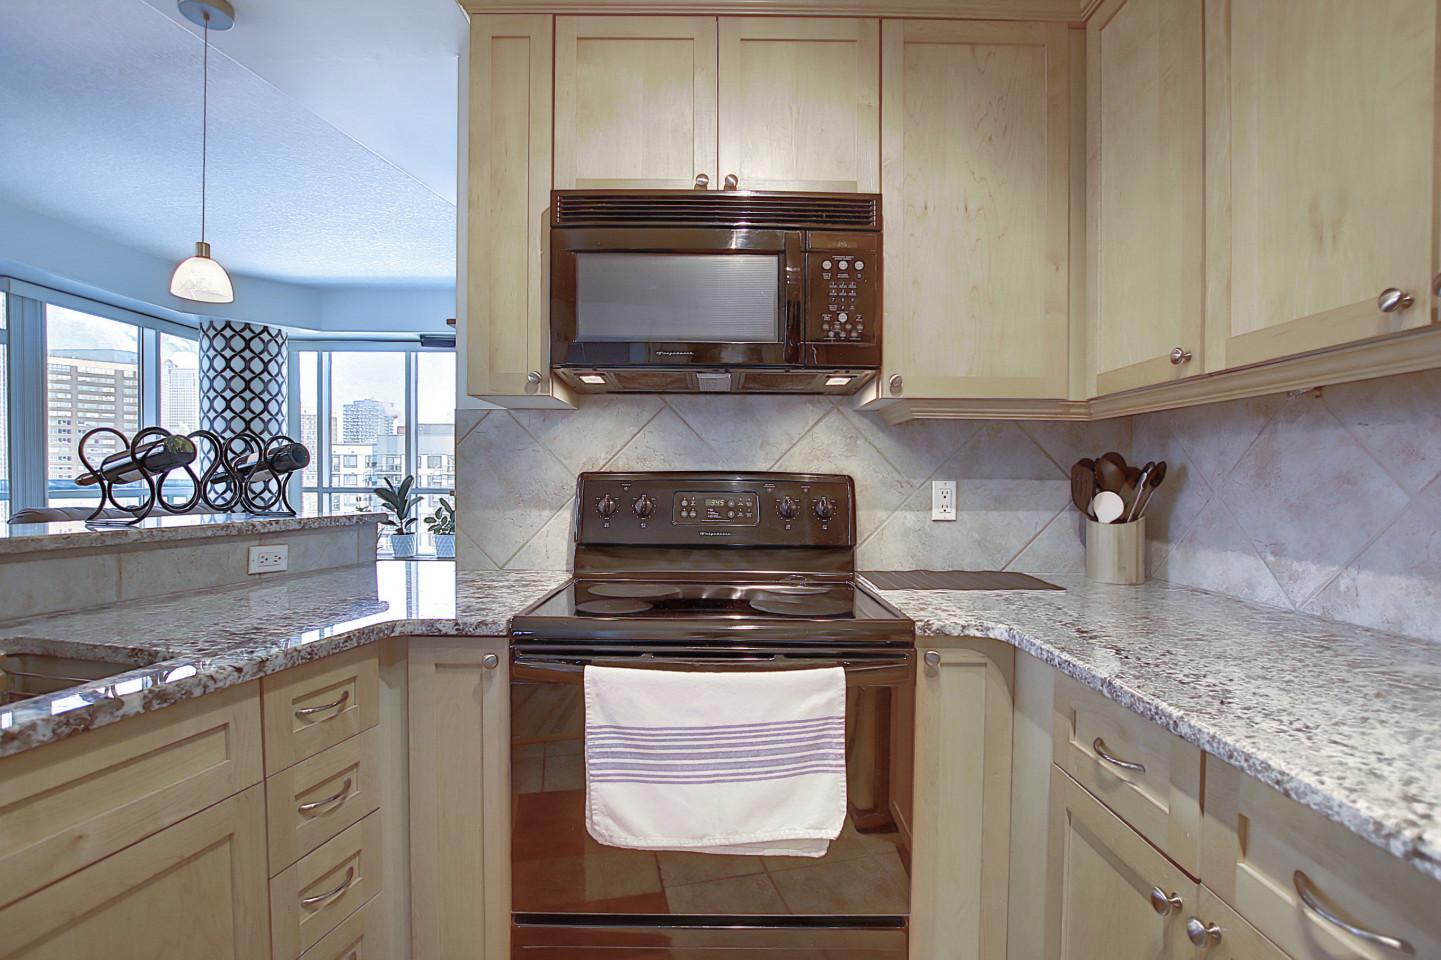 1407, 836 15 Avenue SW, Calgary, Alberta T2R 1S2, 2 Bedrooms Bedrooms, ,2 BathroomsBathrooms,Condo,For Rent,15 Avenue SW,1407,1109